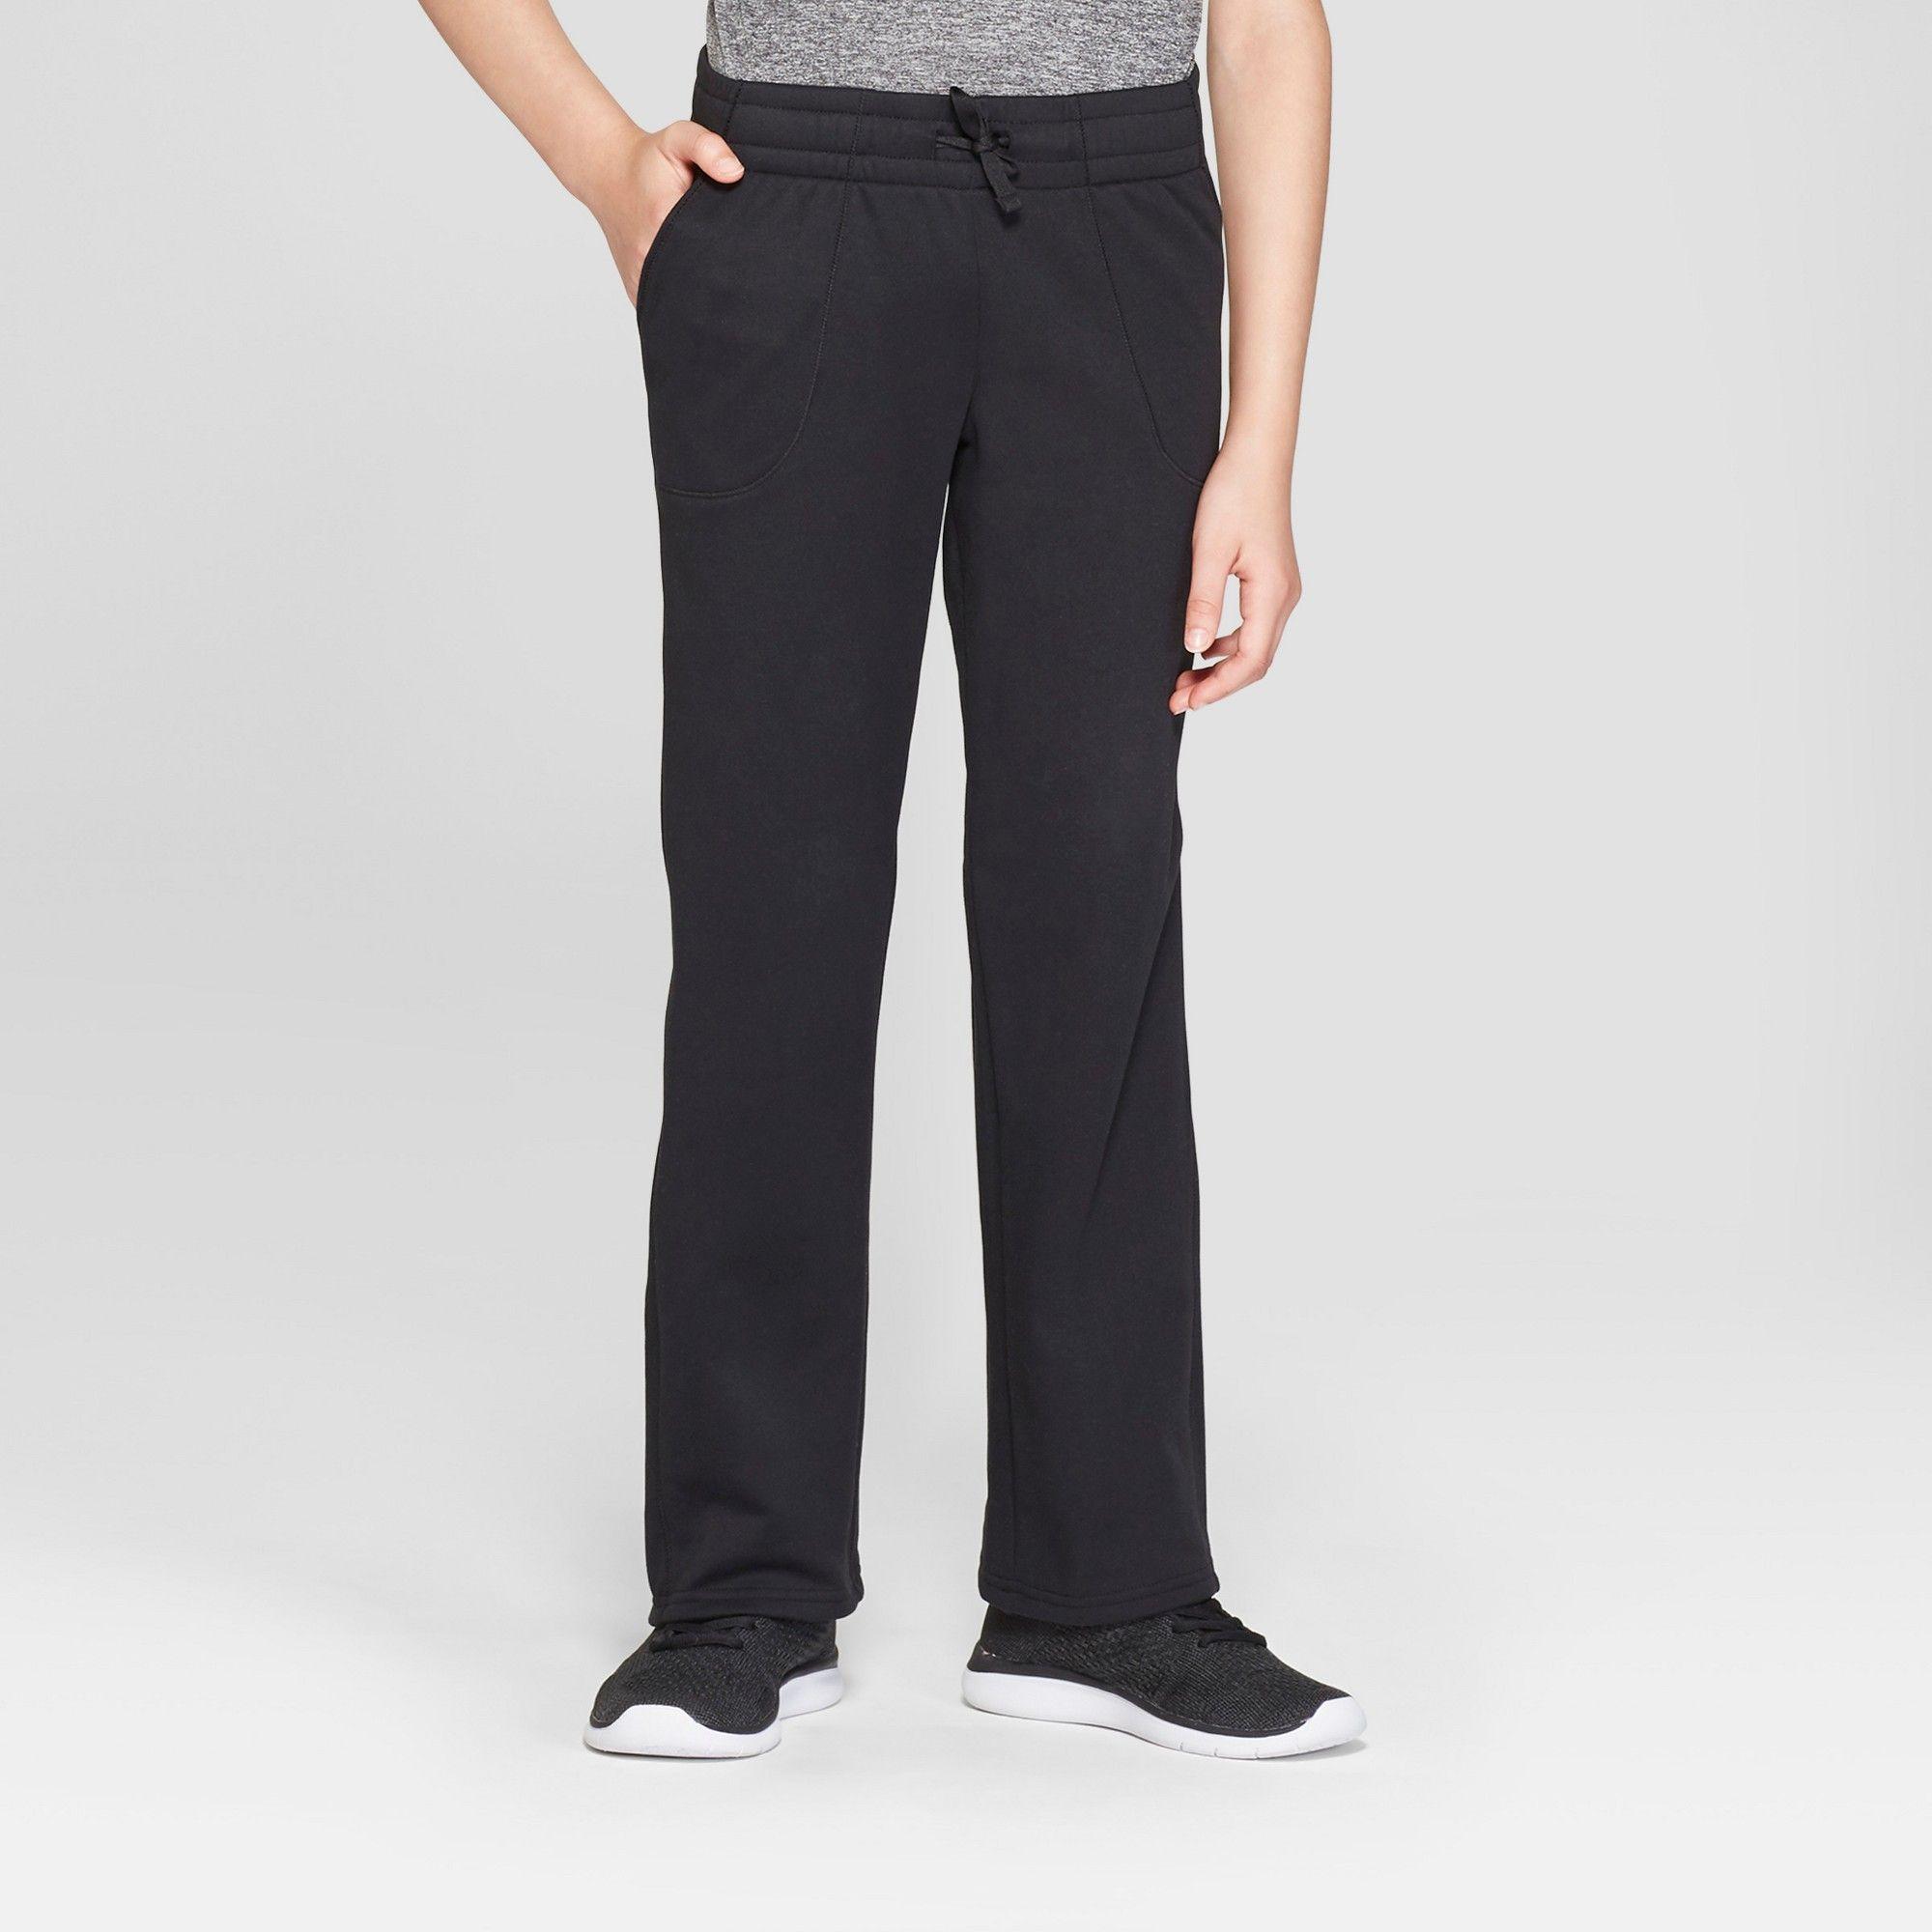 ae556374 Girls' Tech Fleece Pants - C9 Champion Black XS | Products